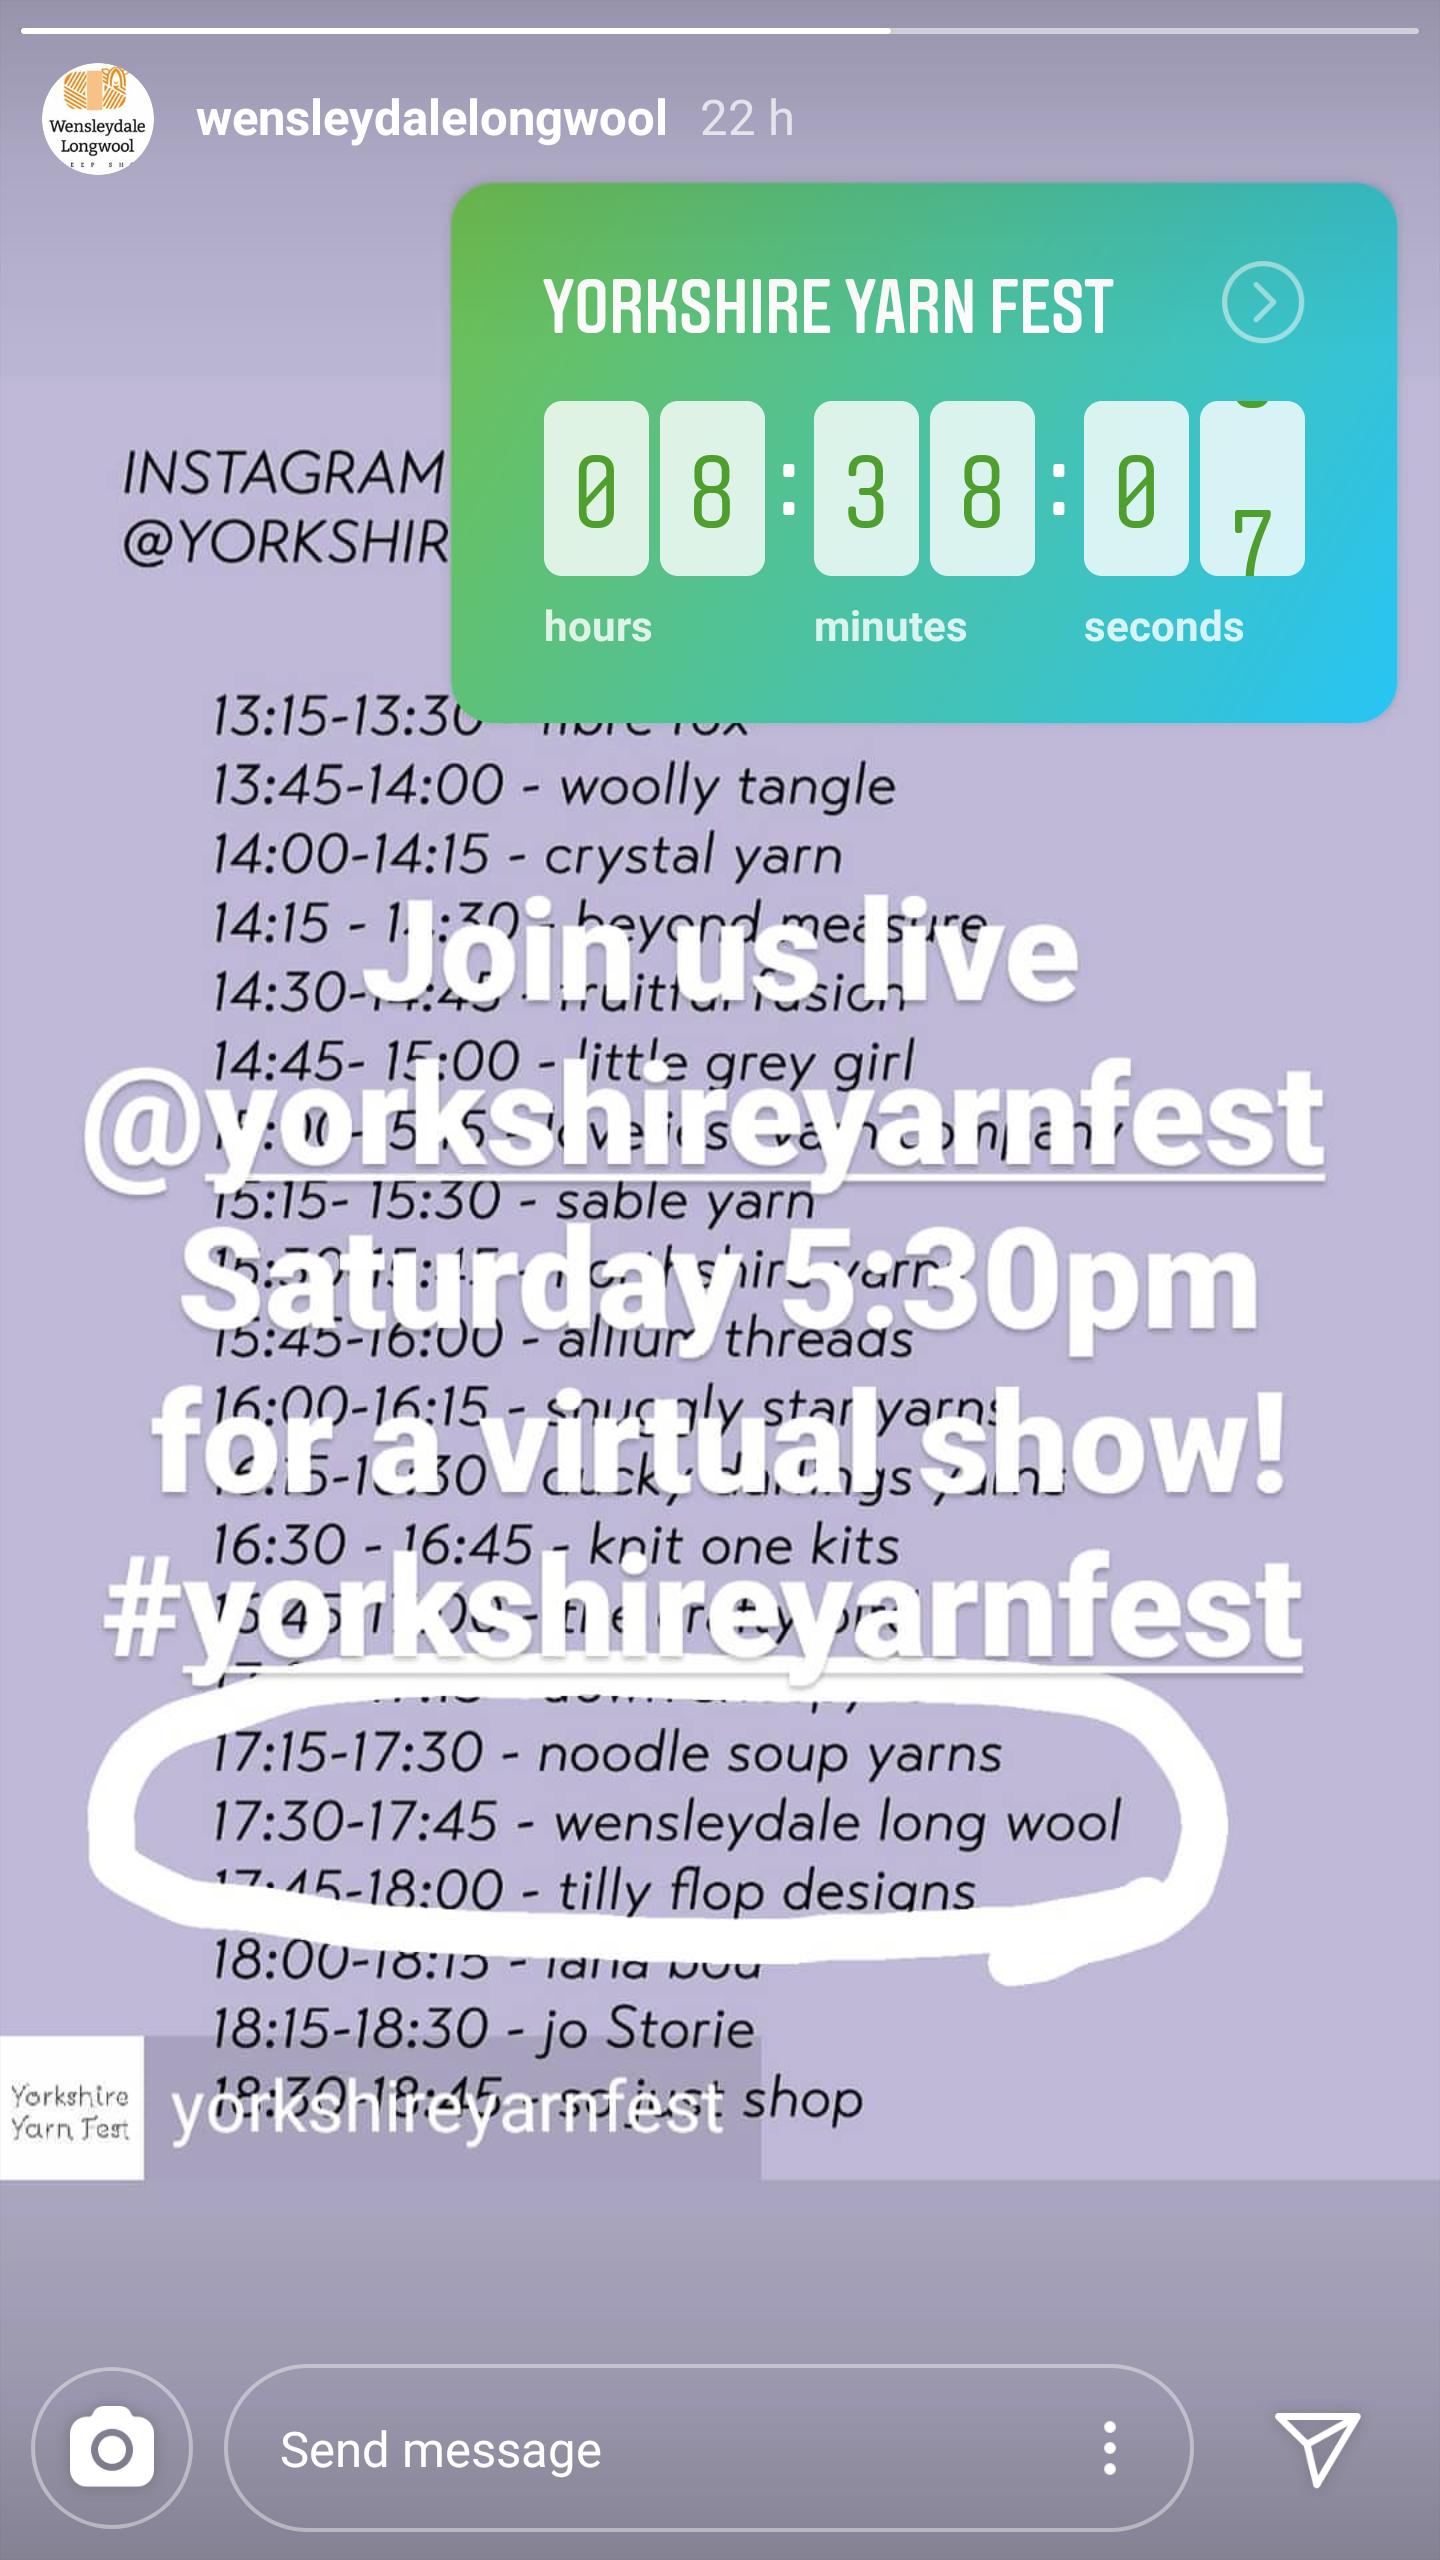 Yorkshire Yarn Fest schedule